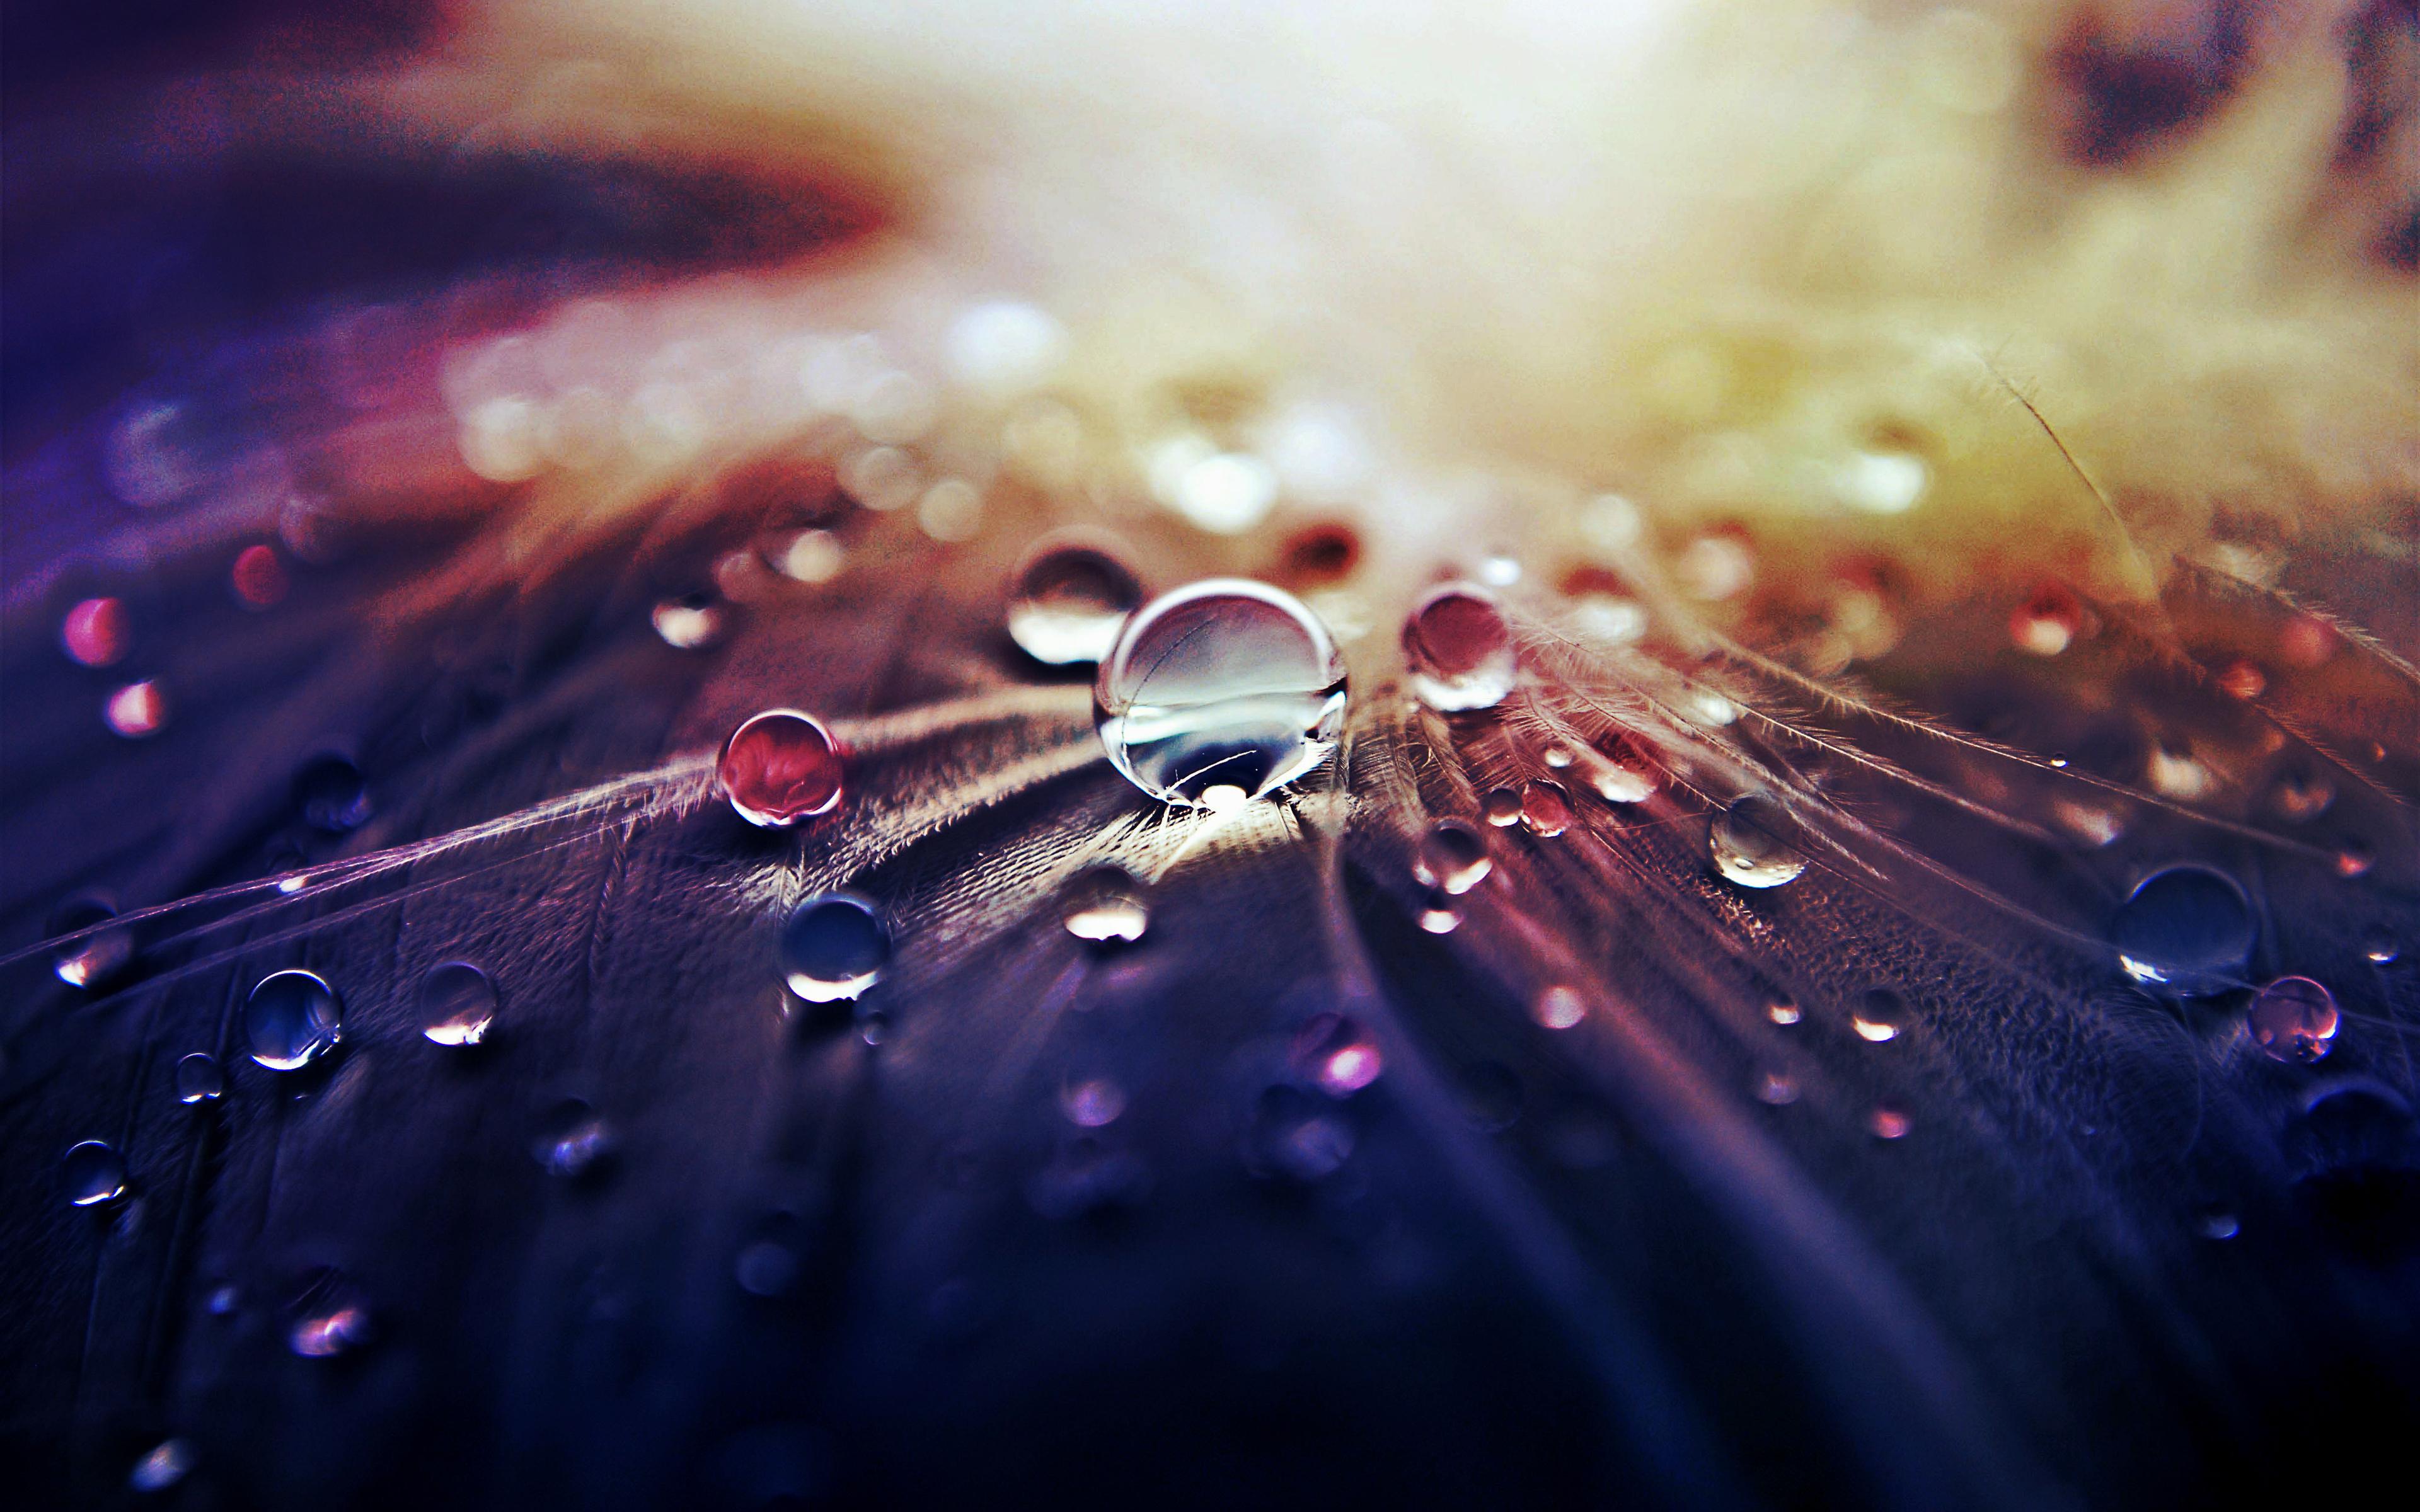 Water Drop HD Image